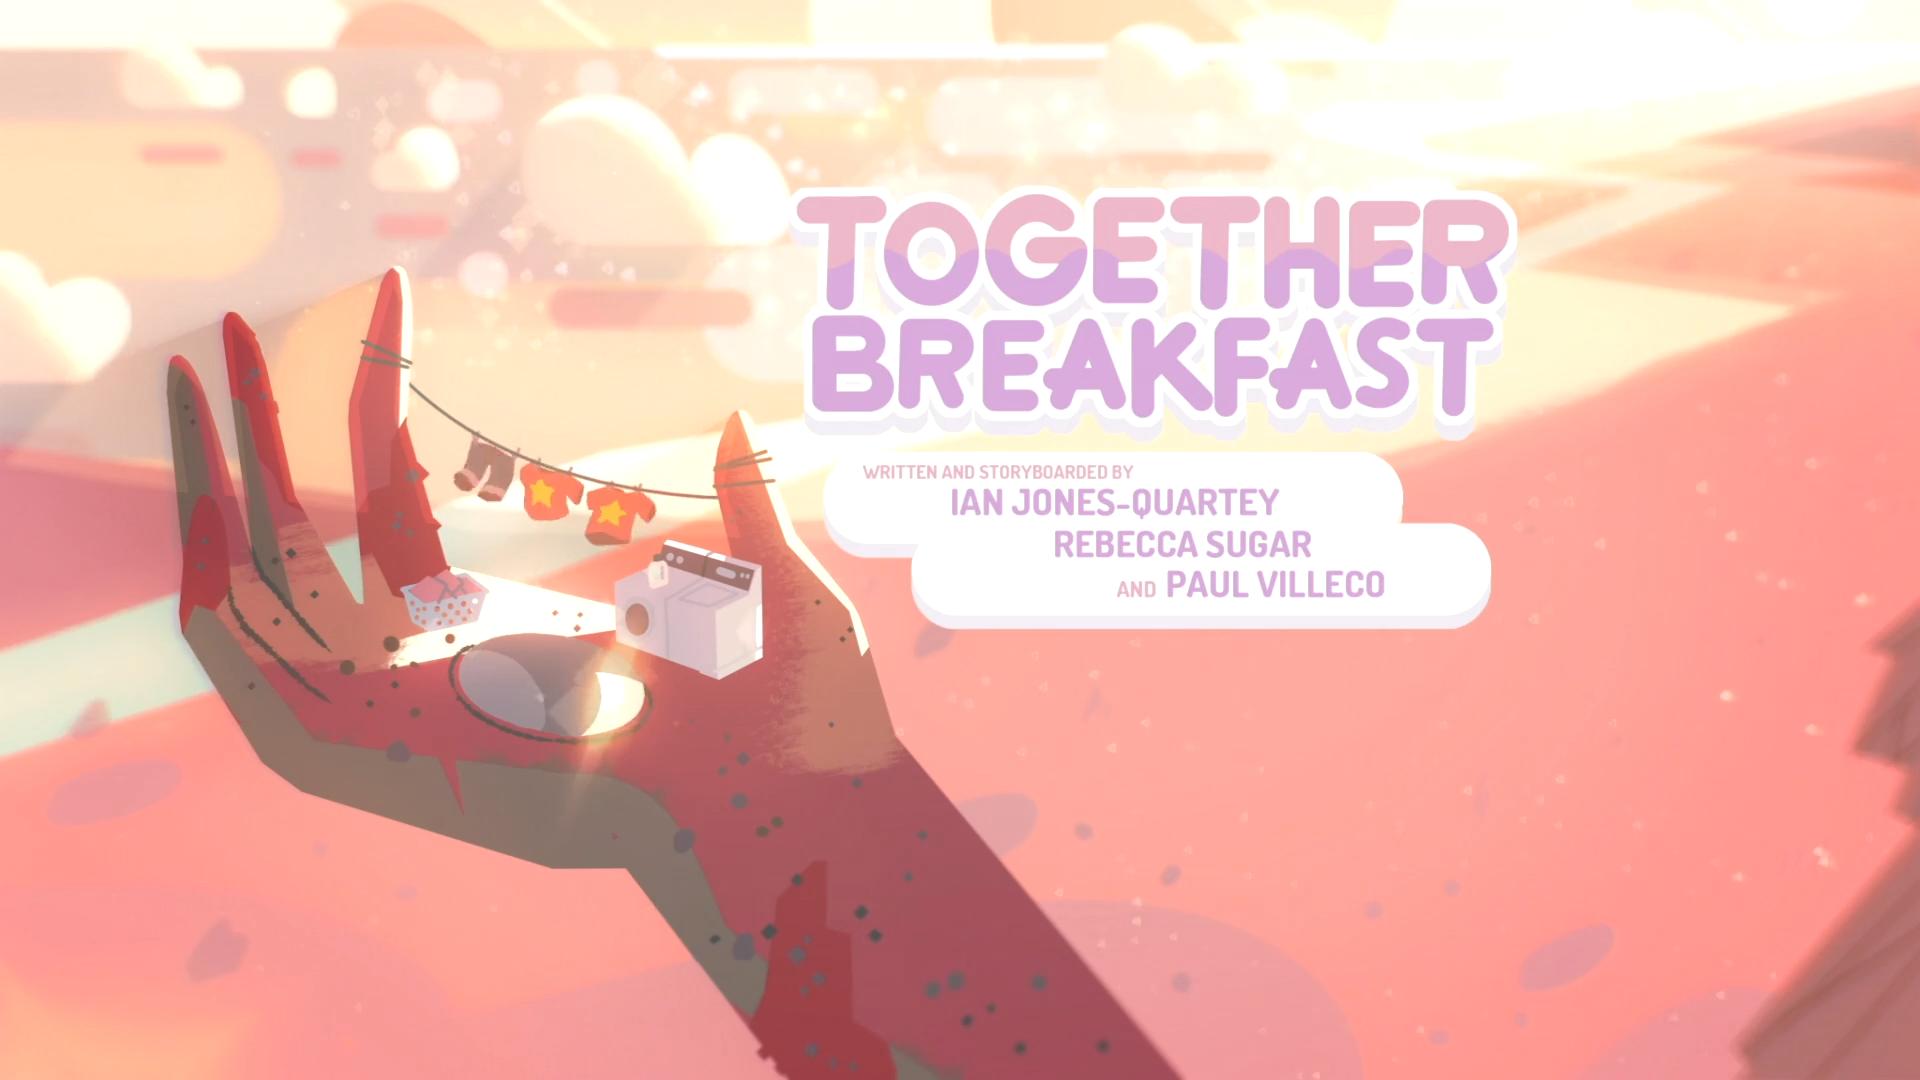 Together Breakfast